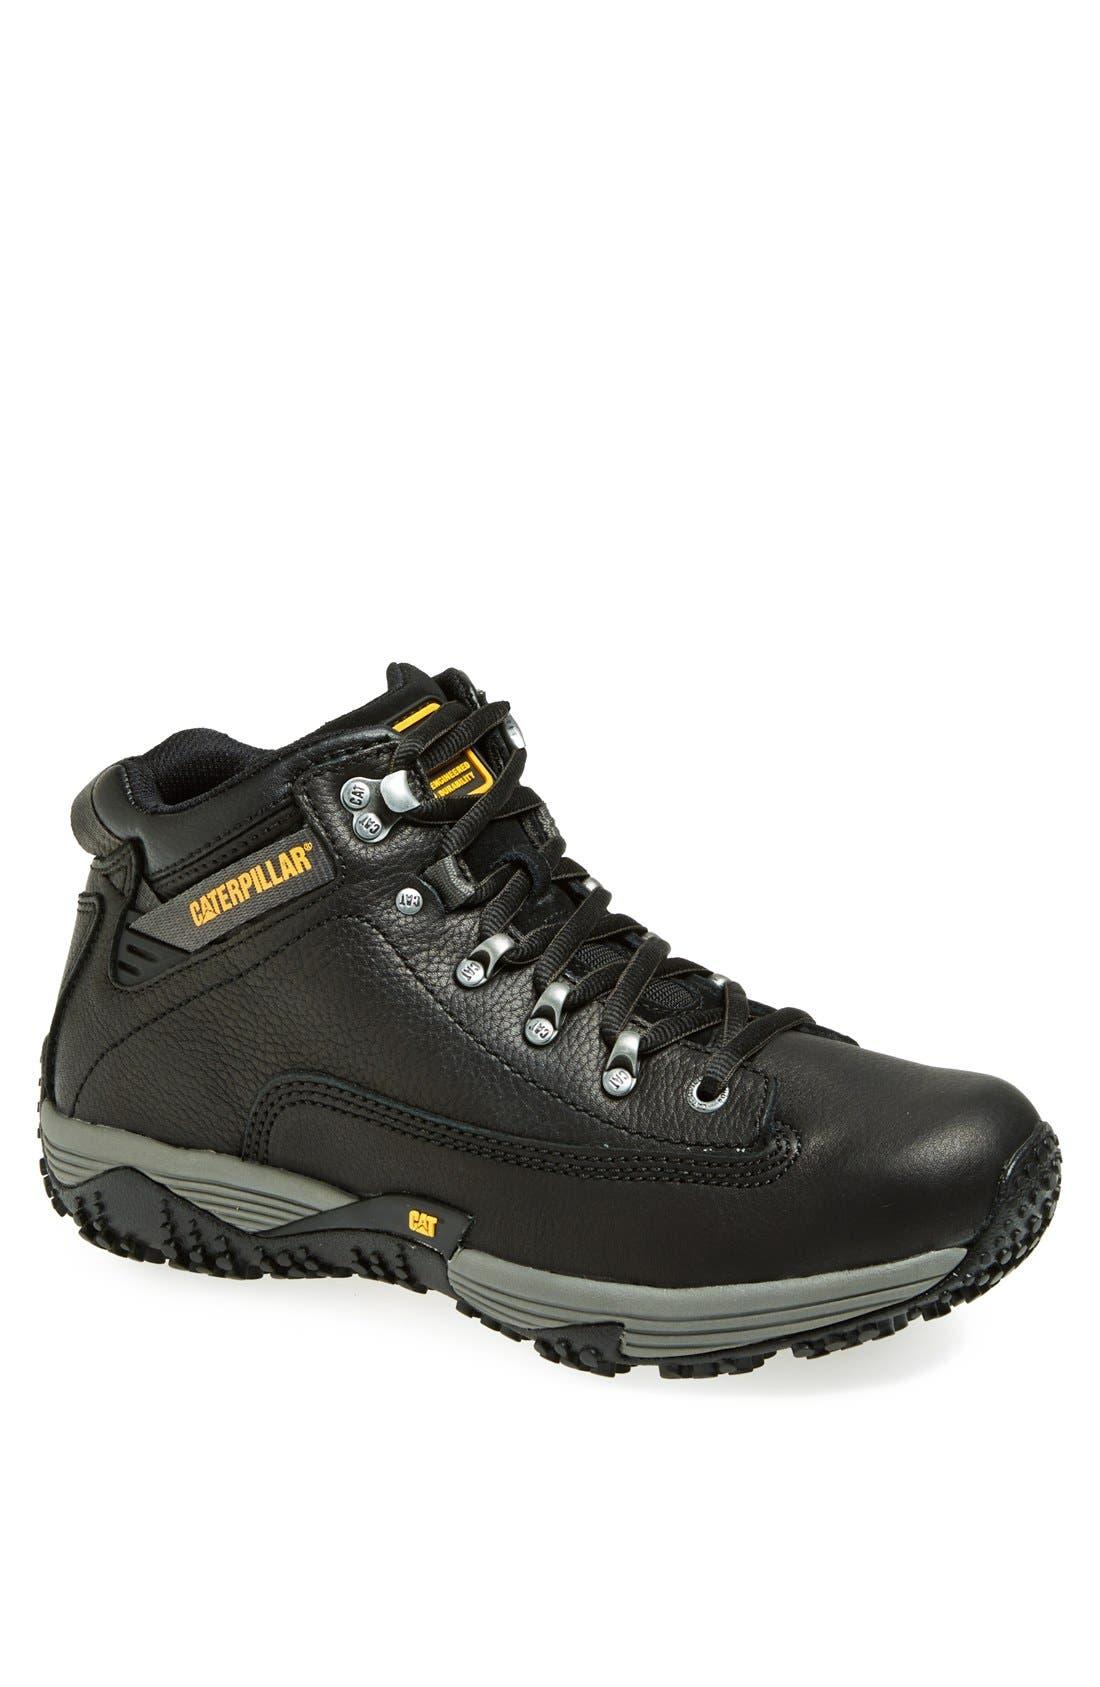 Main Image - Caterpillar 'Corax' Hiking Boot (Men)